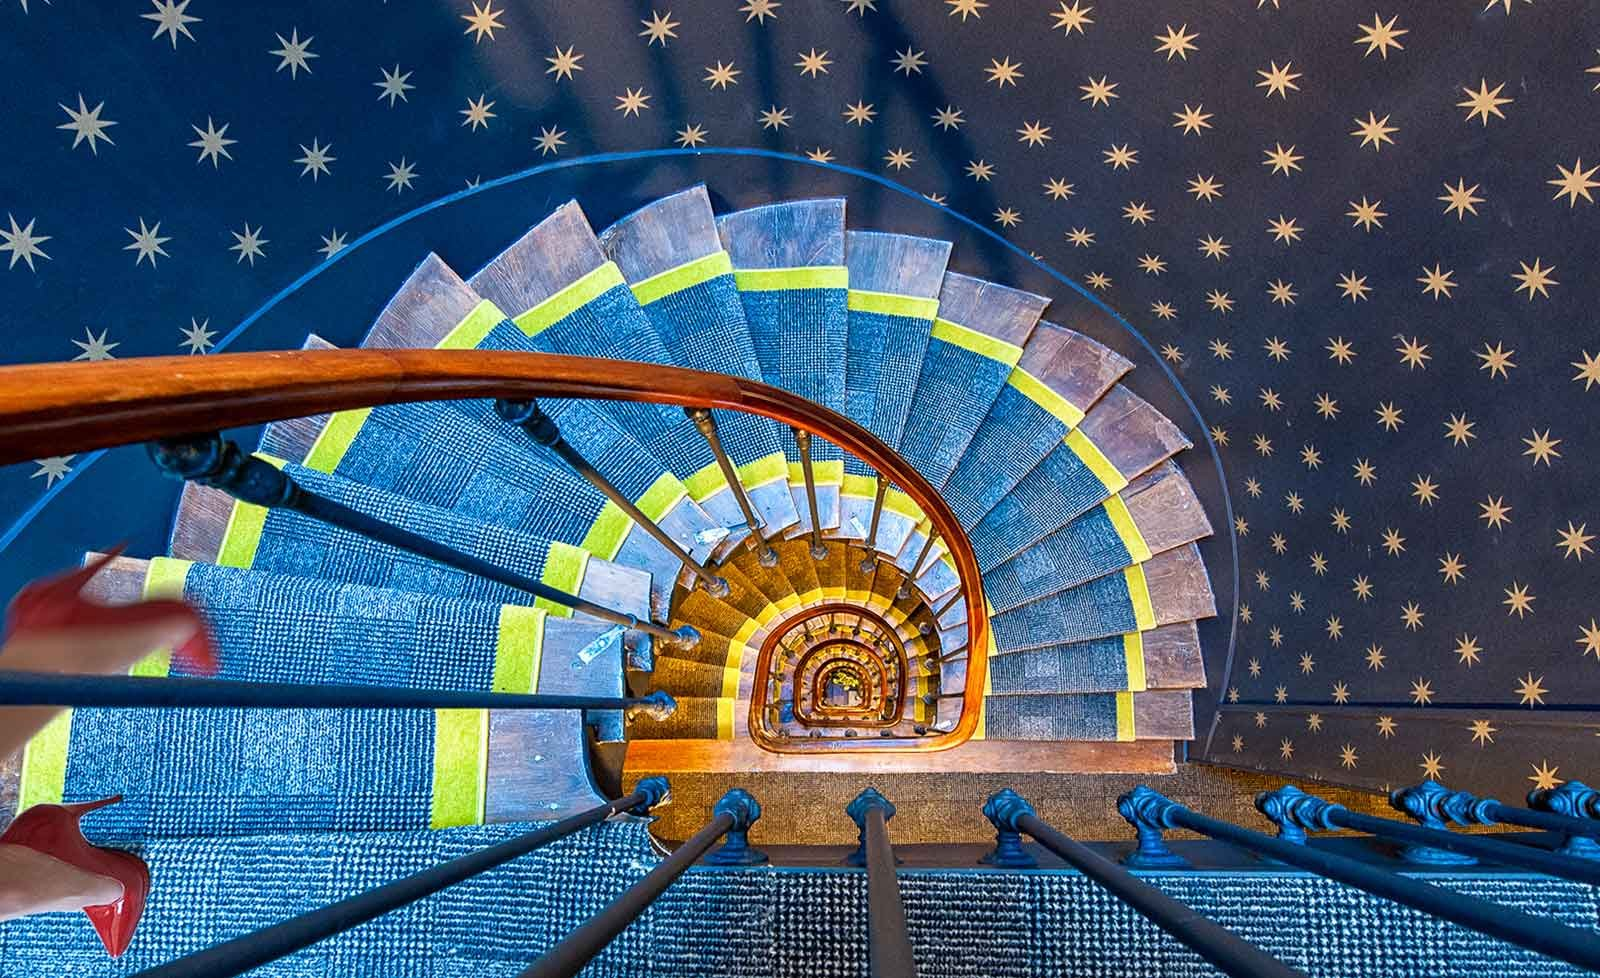 Papel Tapiz Fotomural - Escalera De Caracol Alfombra Talones Pared Estrellas - Tema Arquitectura - L - 254cm x 184cm (an. x alto) - 2 Tiras - impreso en papel 130g/m2 EasyInstall -